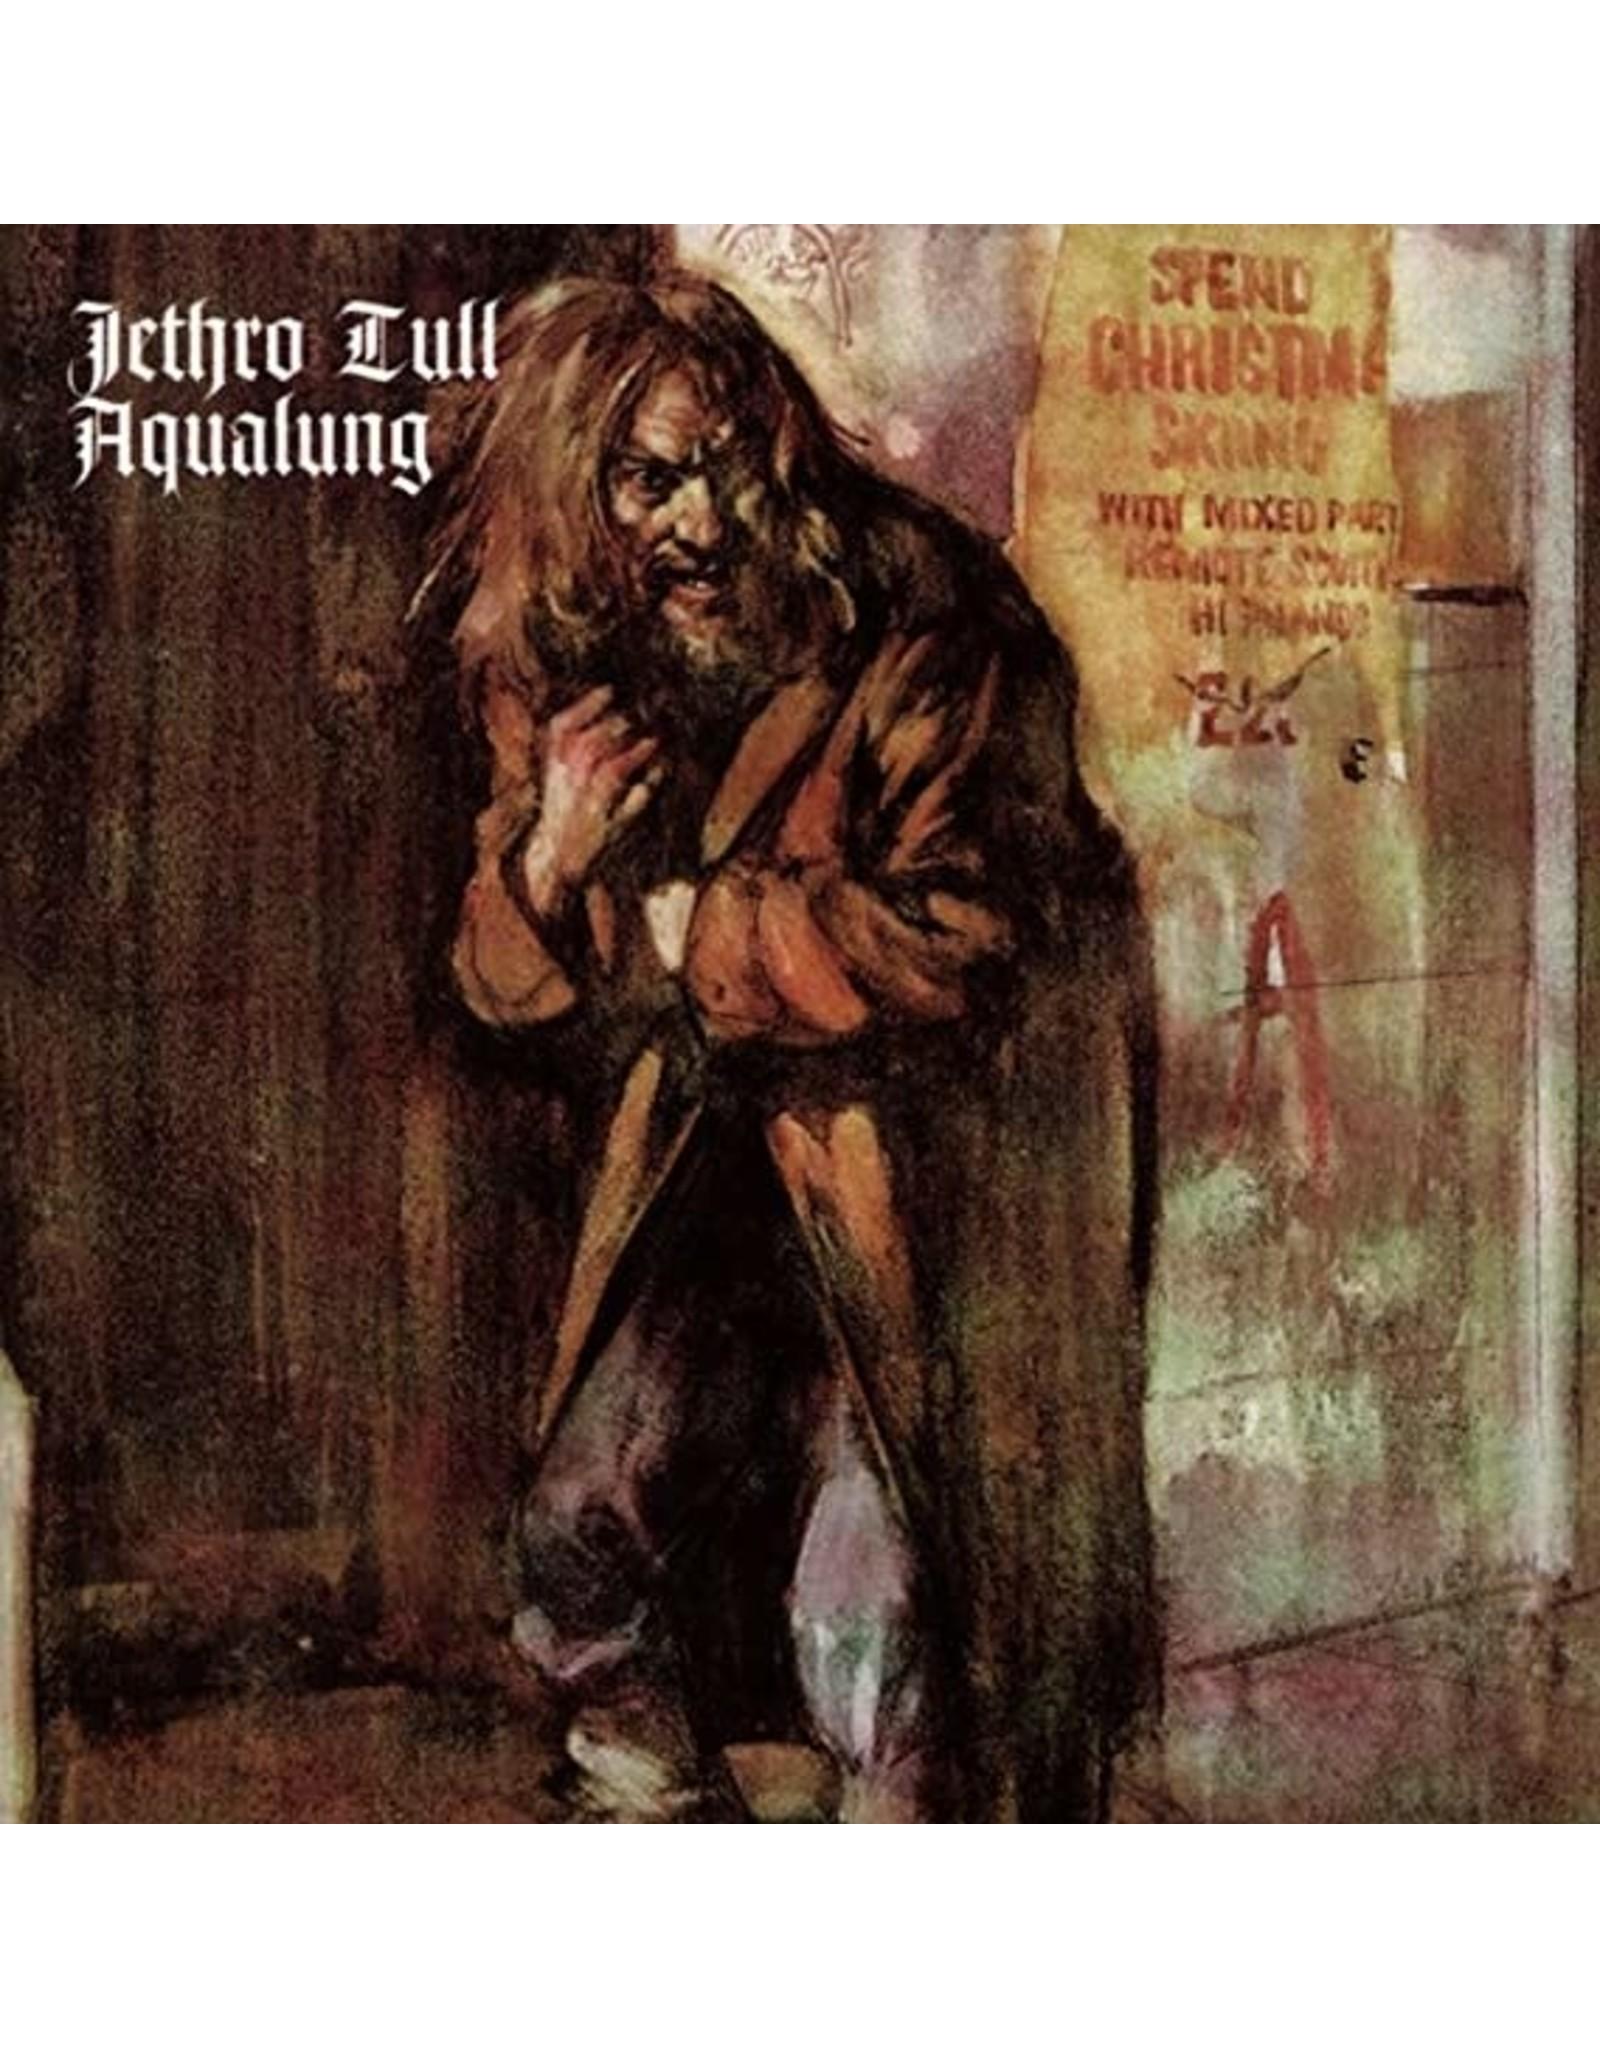 Jethro Tull - Aqualung LP (Steven Wilson Mix)